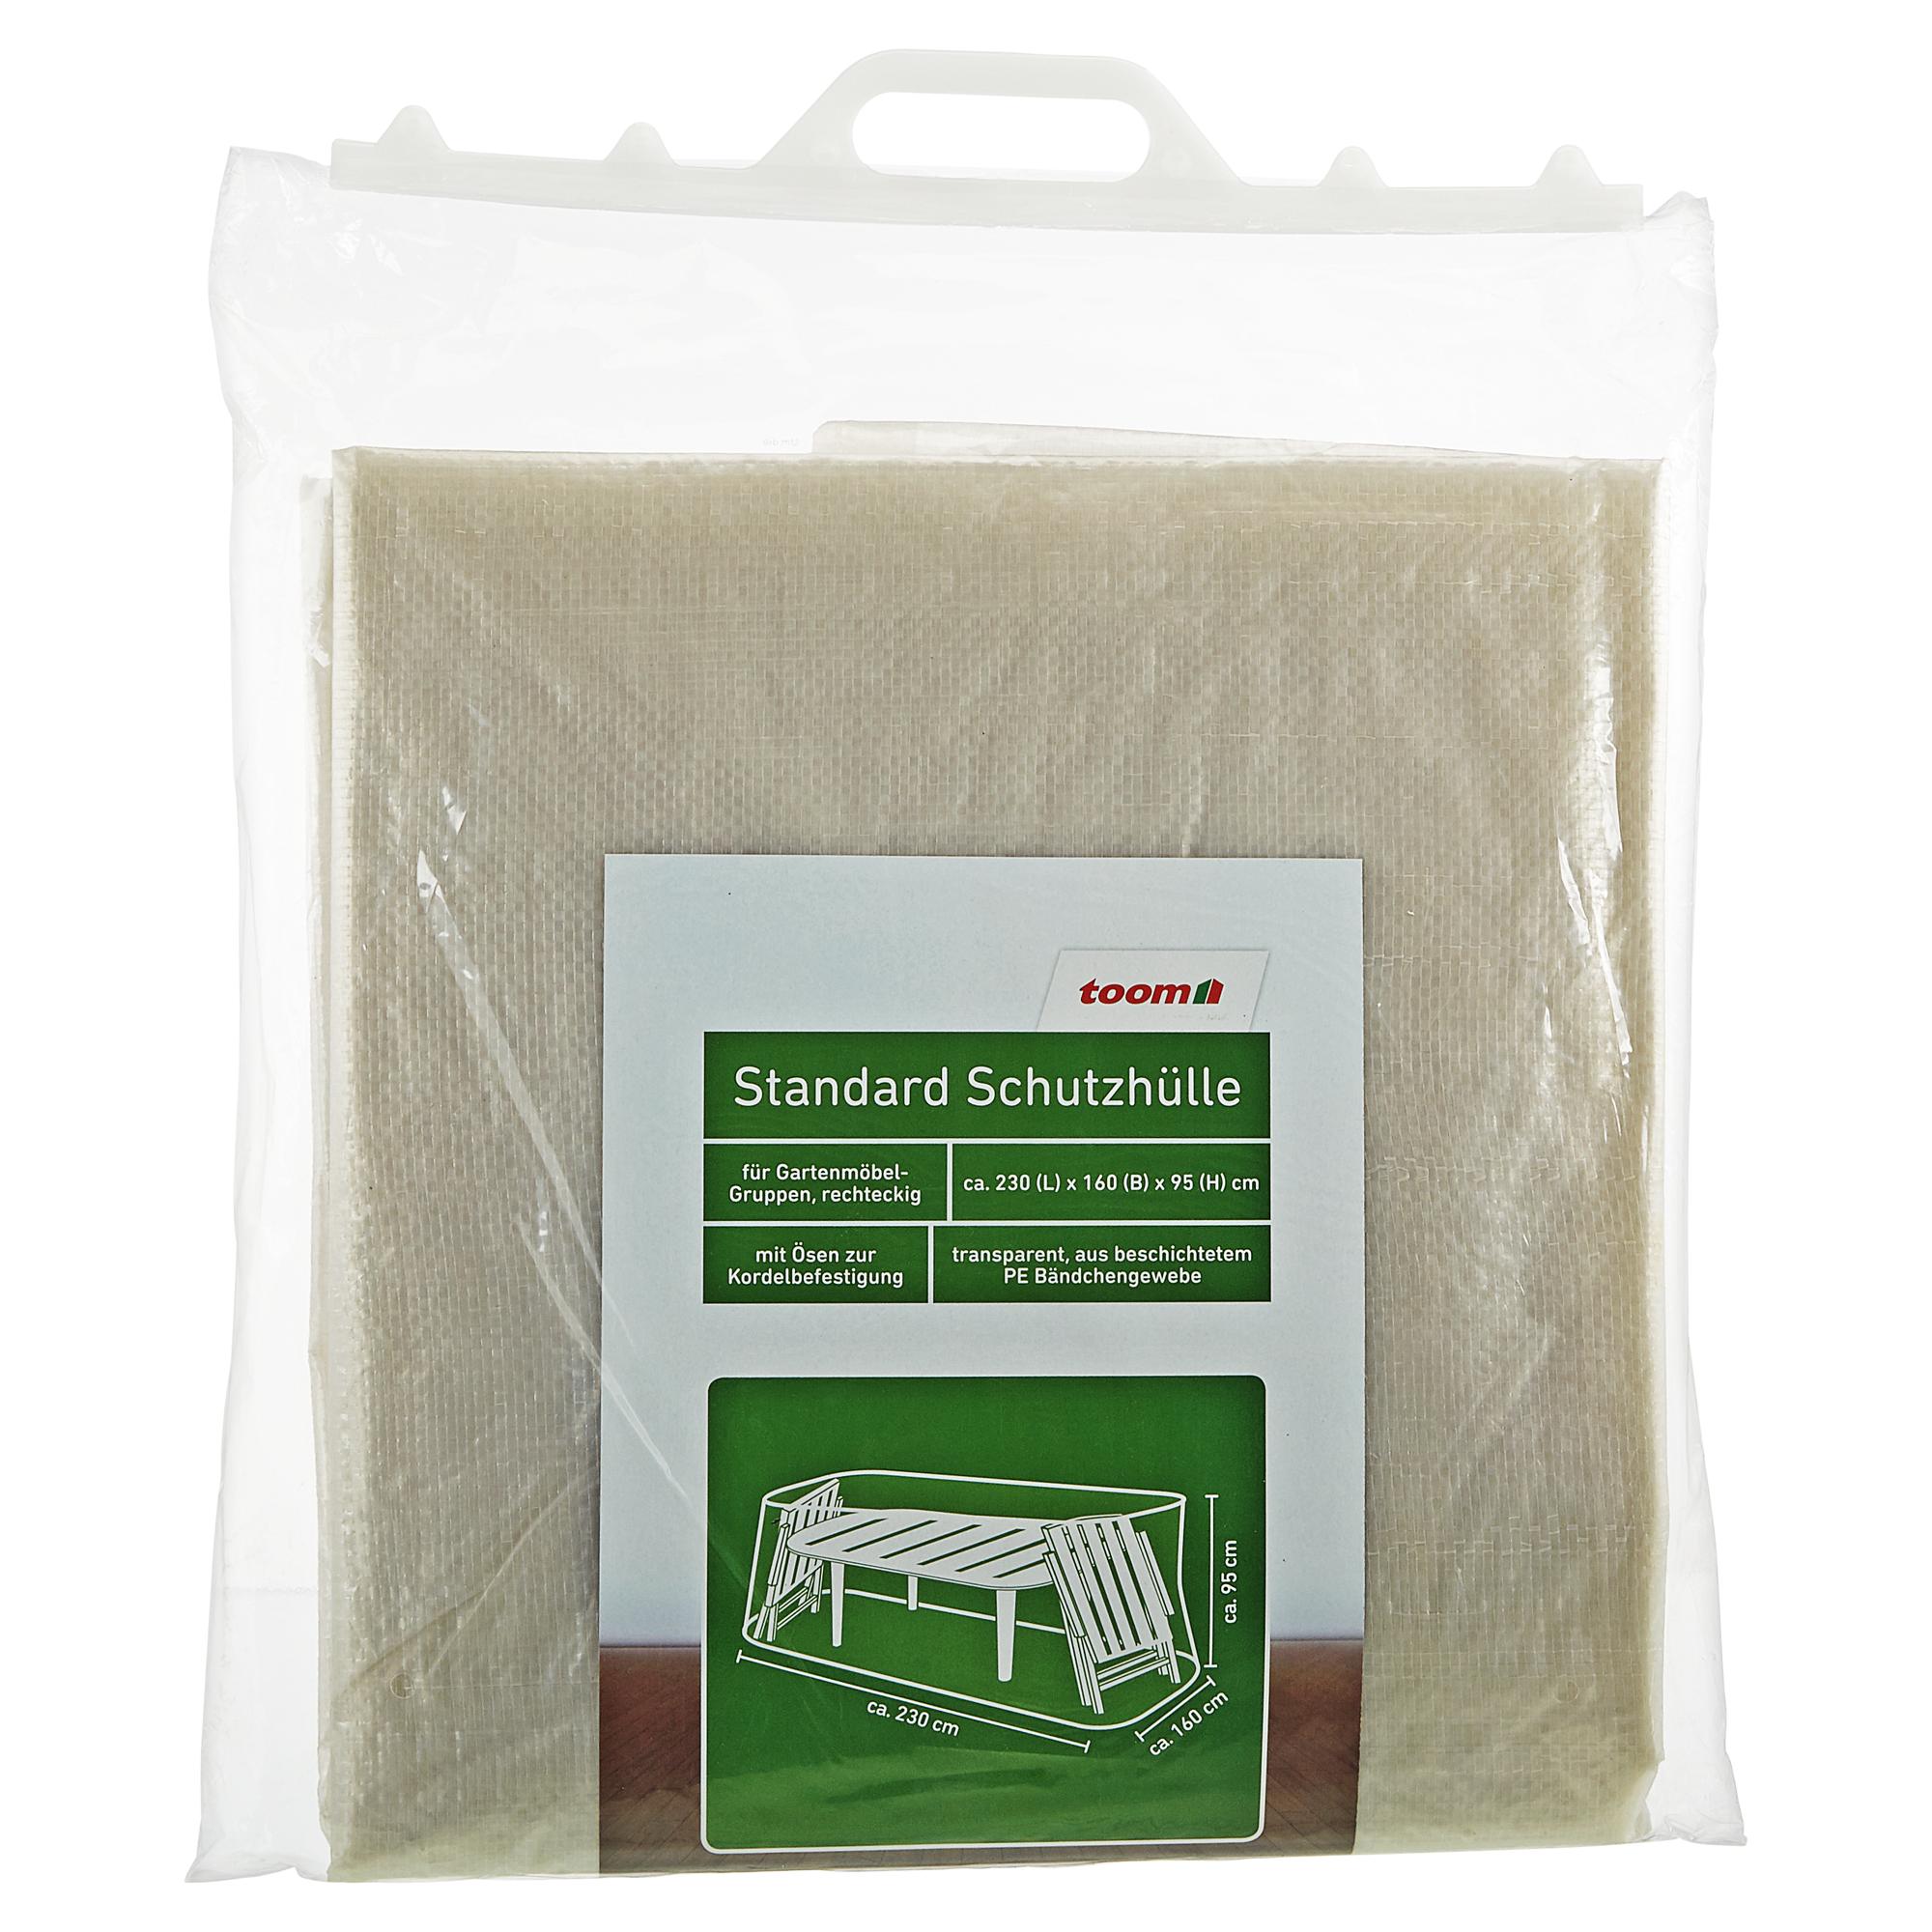 Toom Standard Schutzhülle Für Möbelgruppen PE Bändchengewebe Transparent  230 X 160 X 95 Cm .